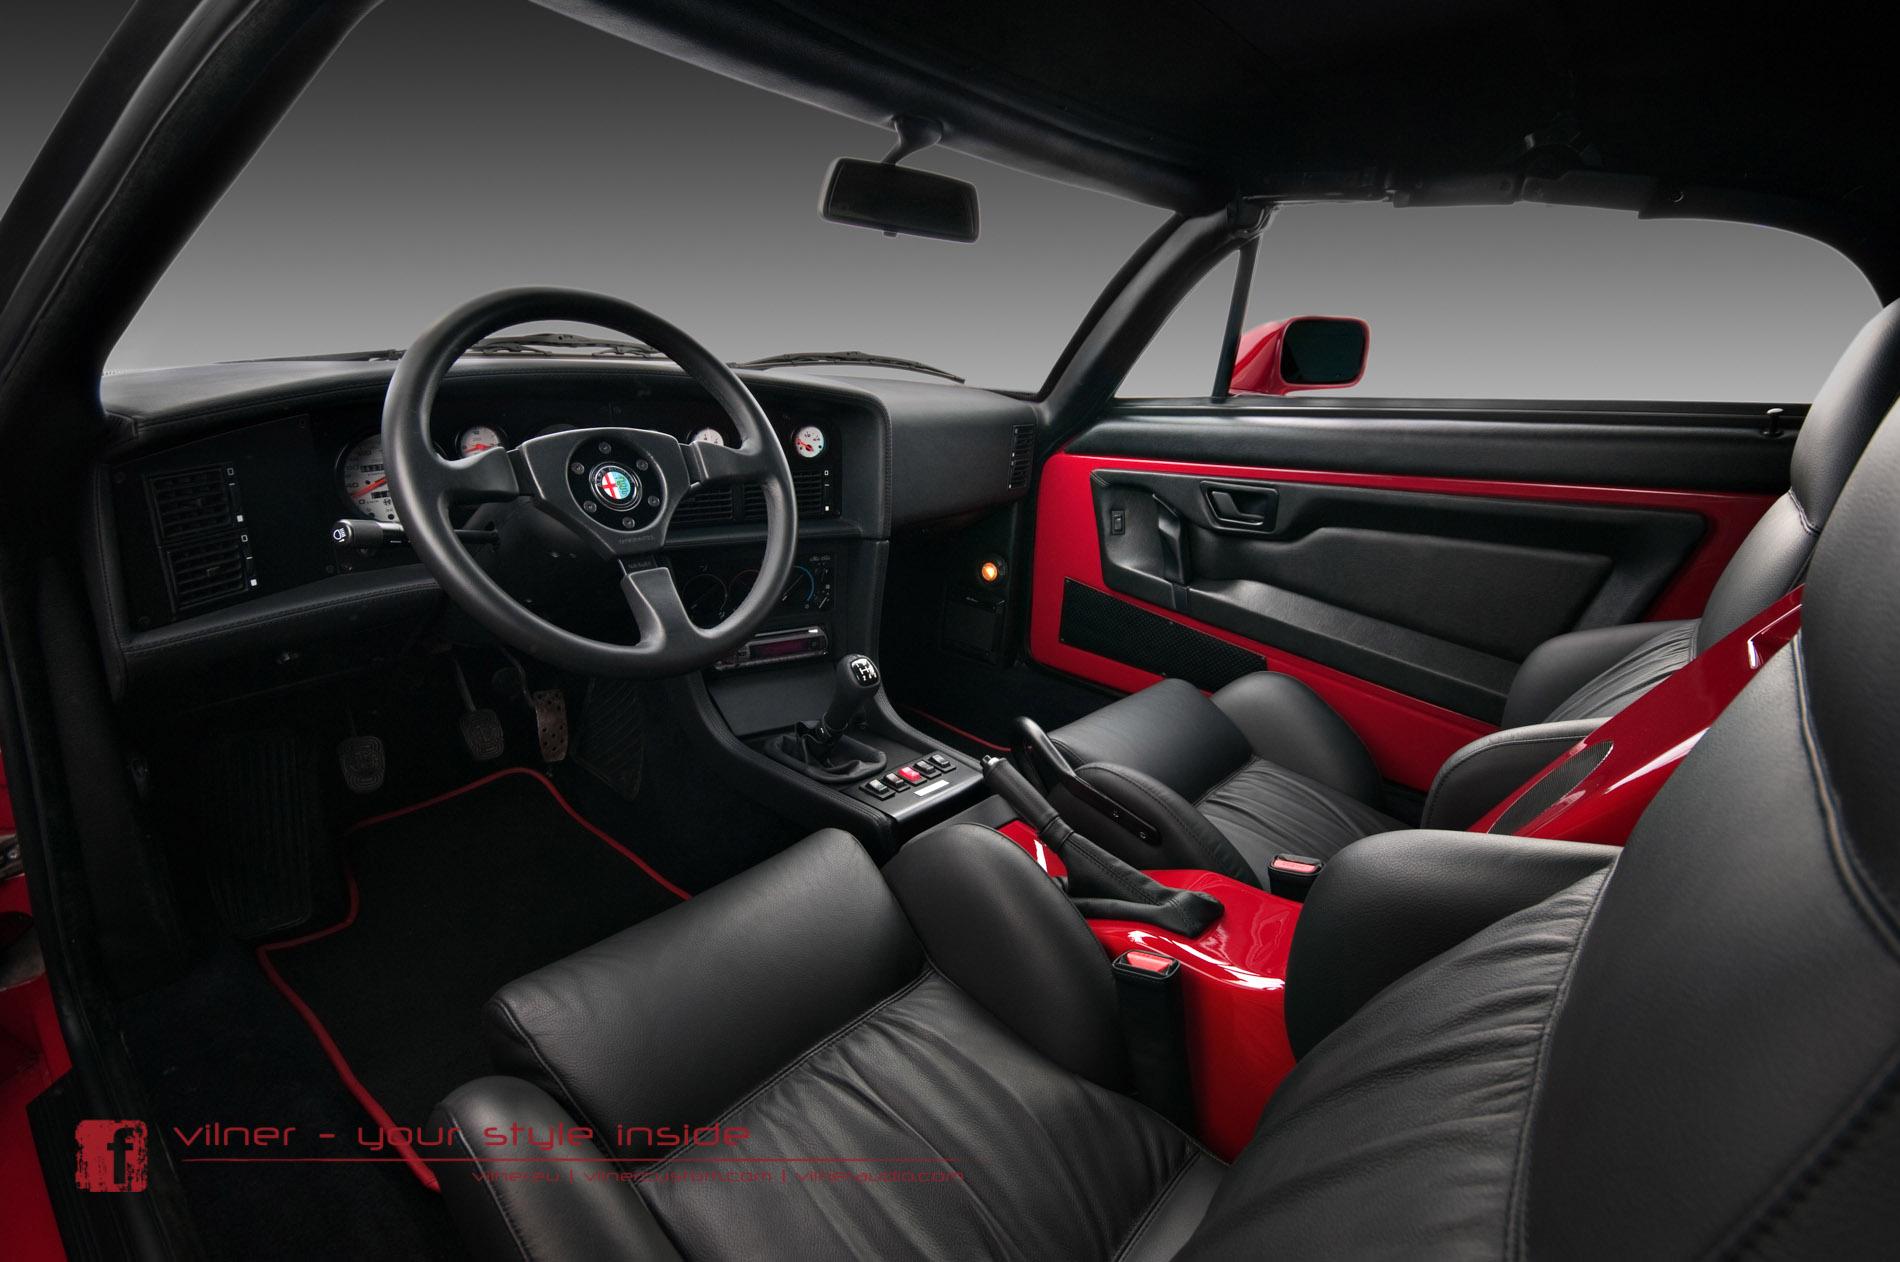 Alfa Romeo Zagato Roadster By Vilner on Alfa Romeo Spider Floor Mats